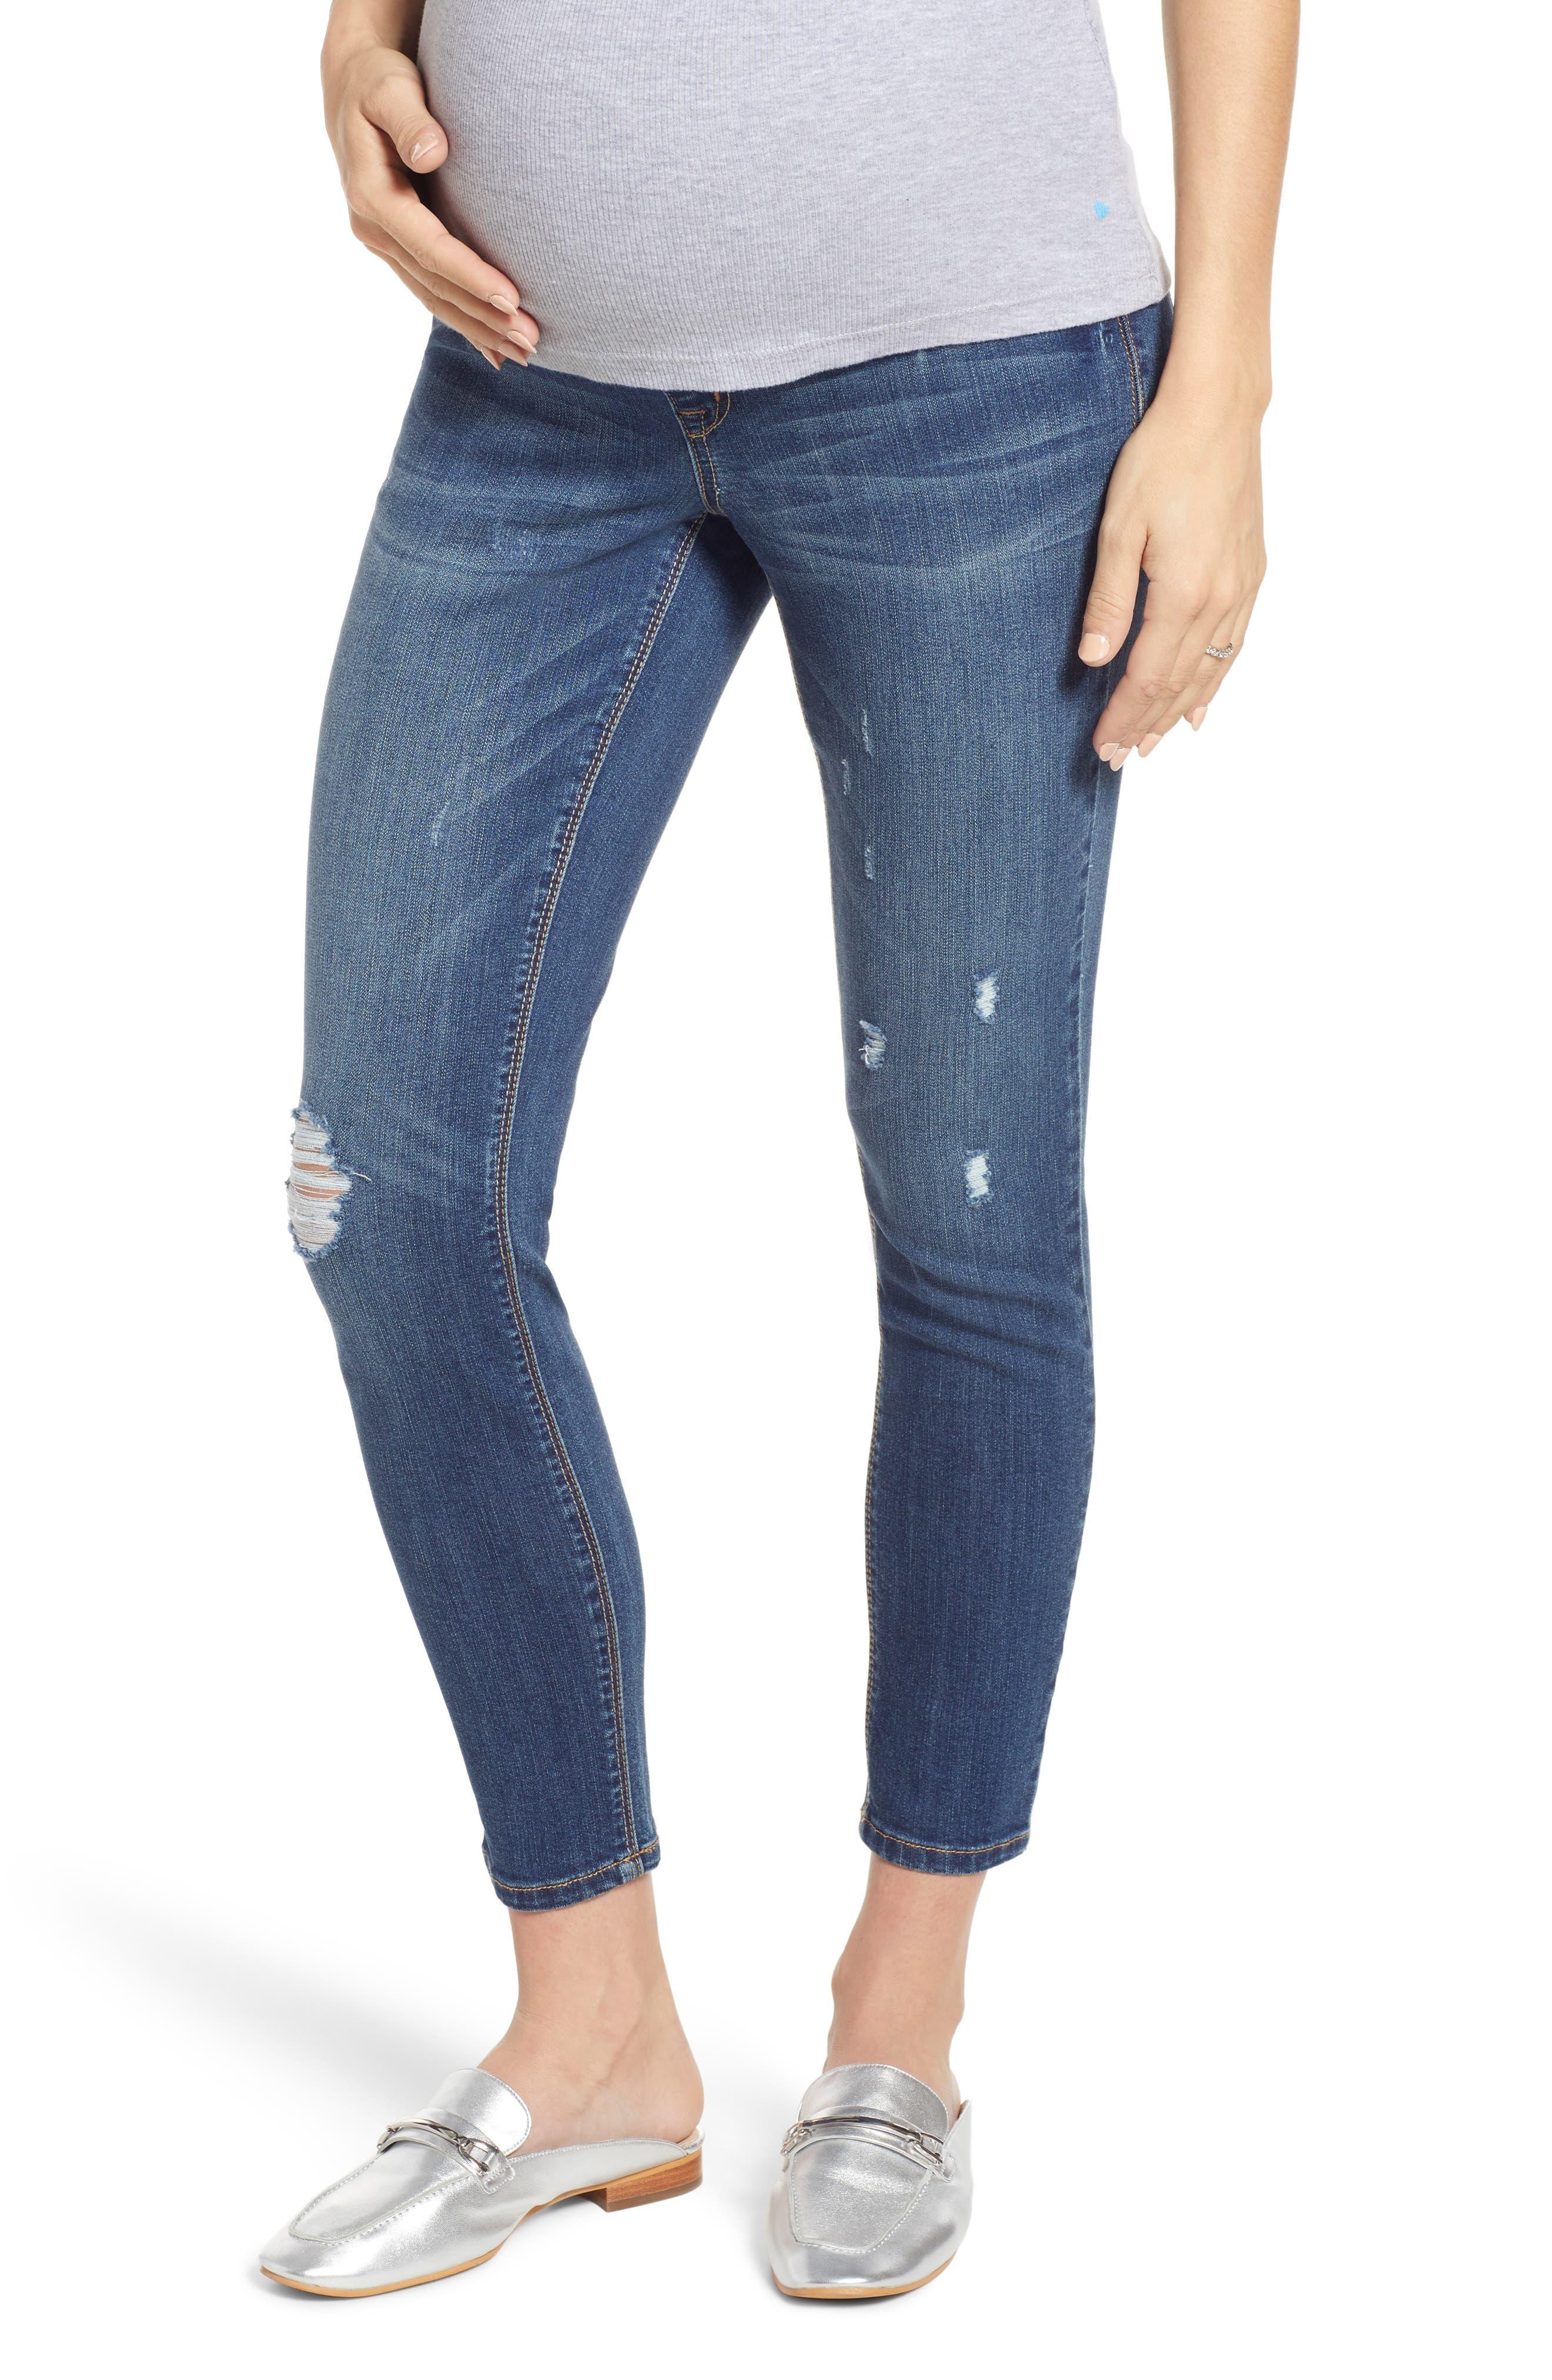 Women's 1822 Denim Distressed Maternity Ankle Skinny Jeans